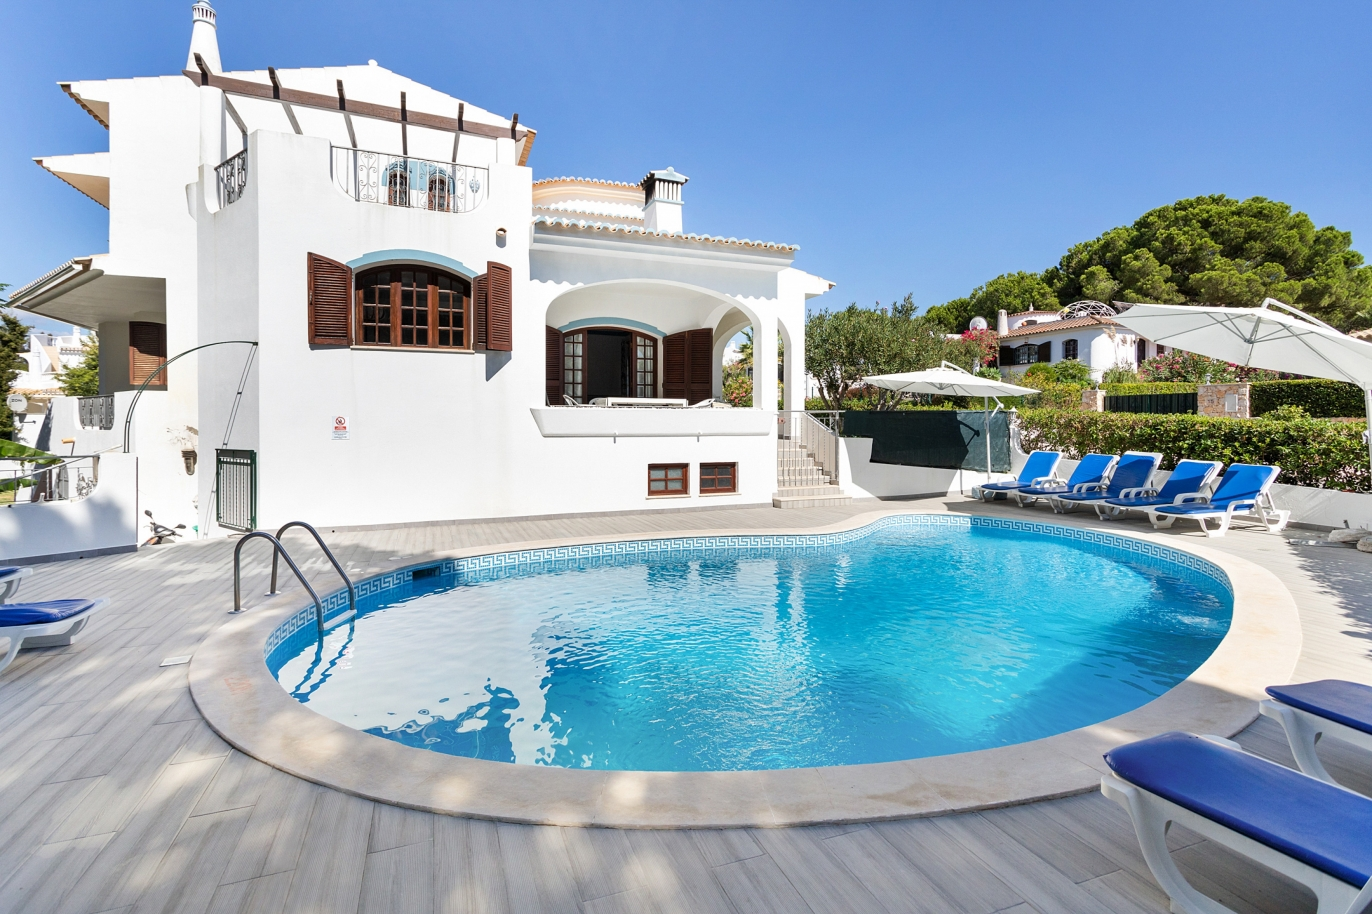 4-bedroom-villa-with-swimming-pool-next-to-the-golf-vilamoura-algarve